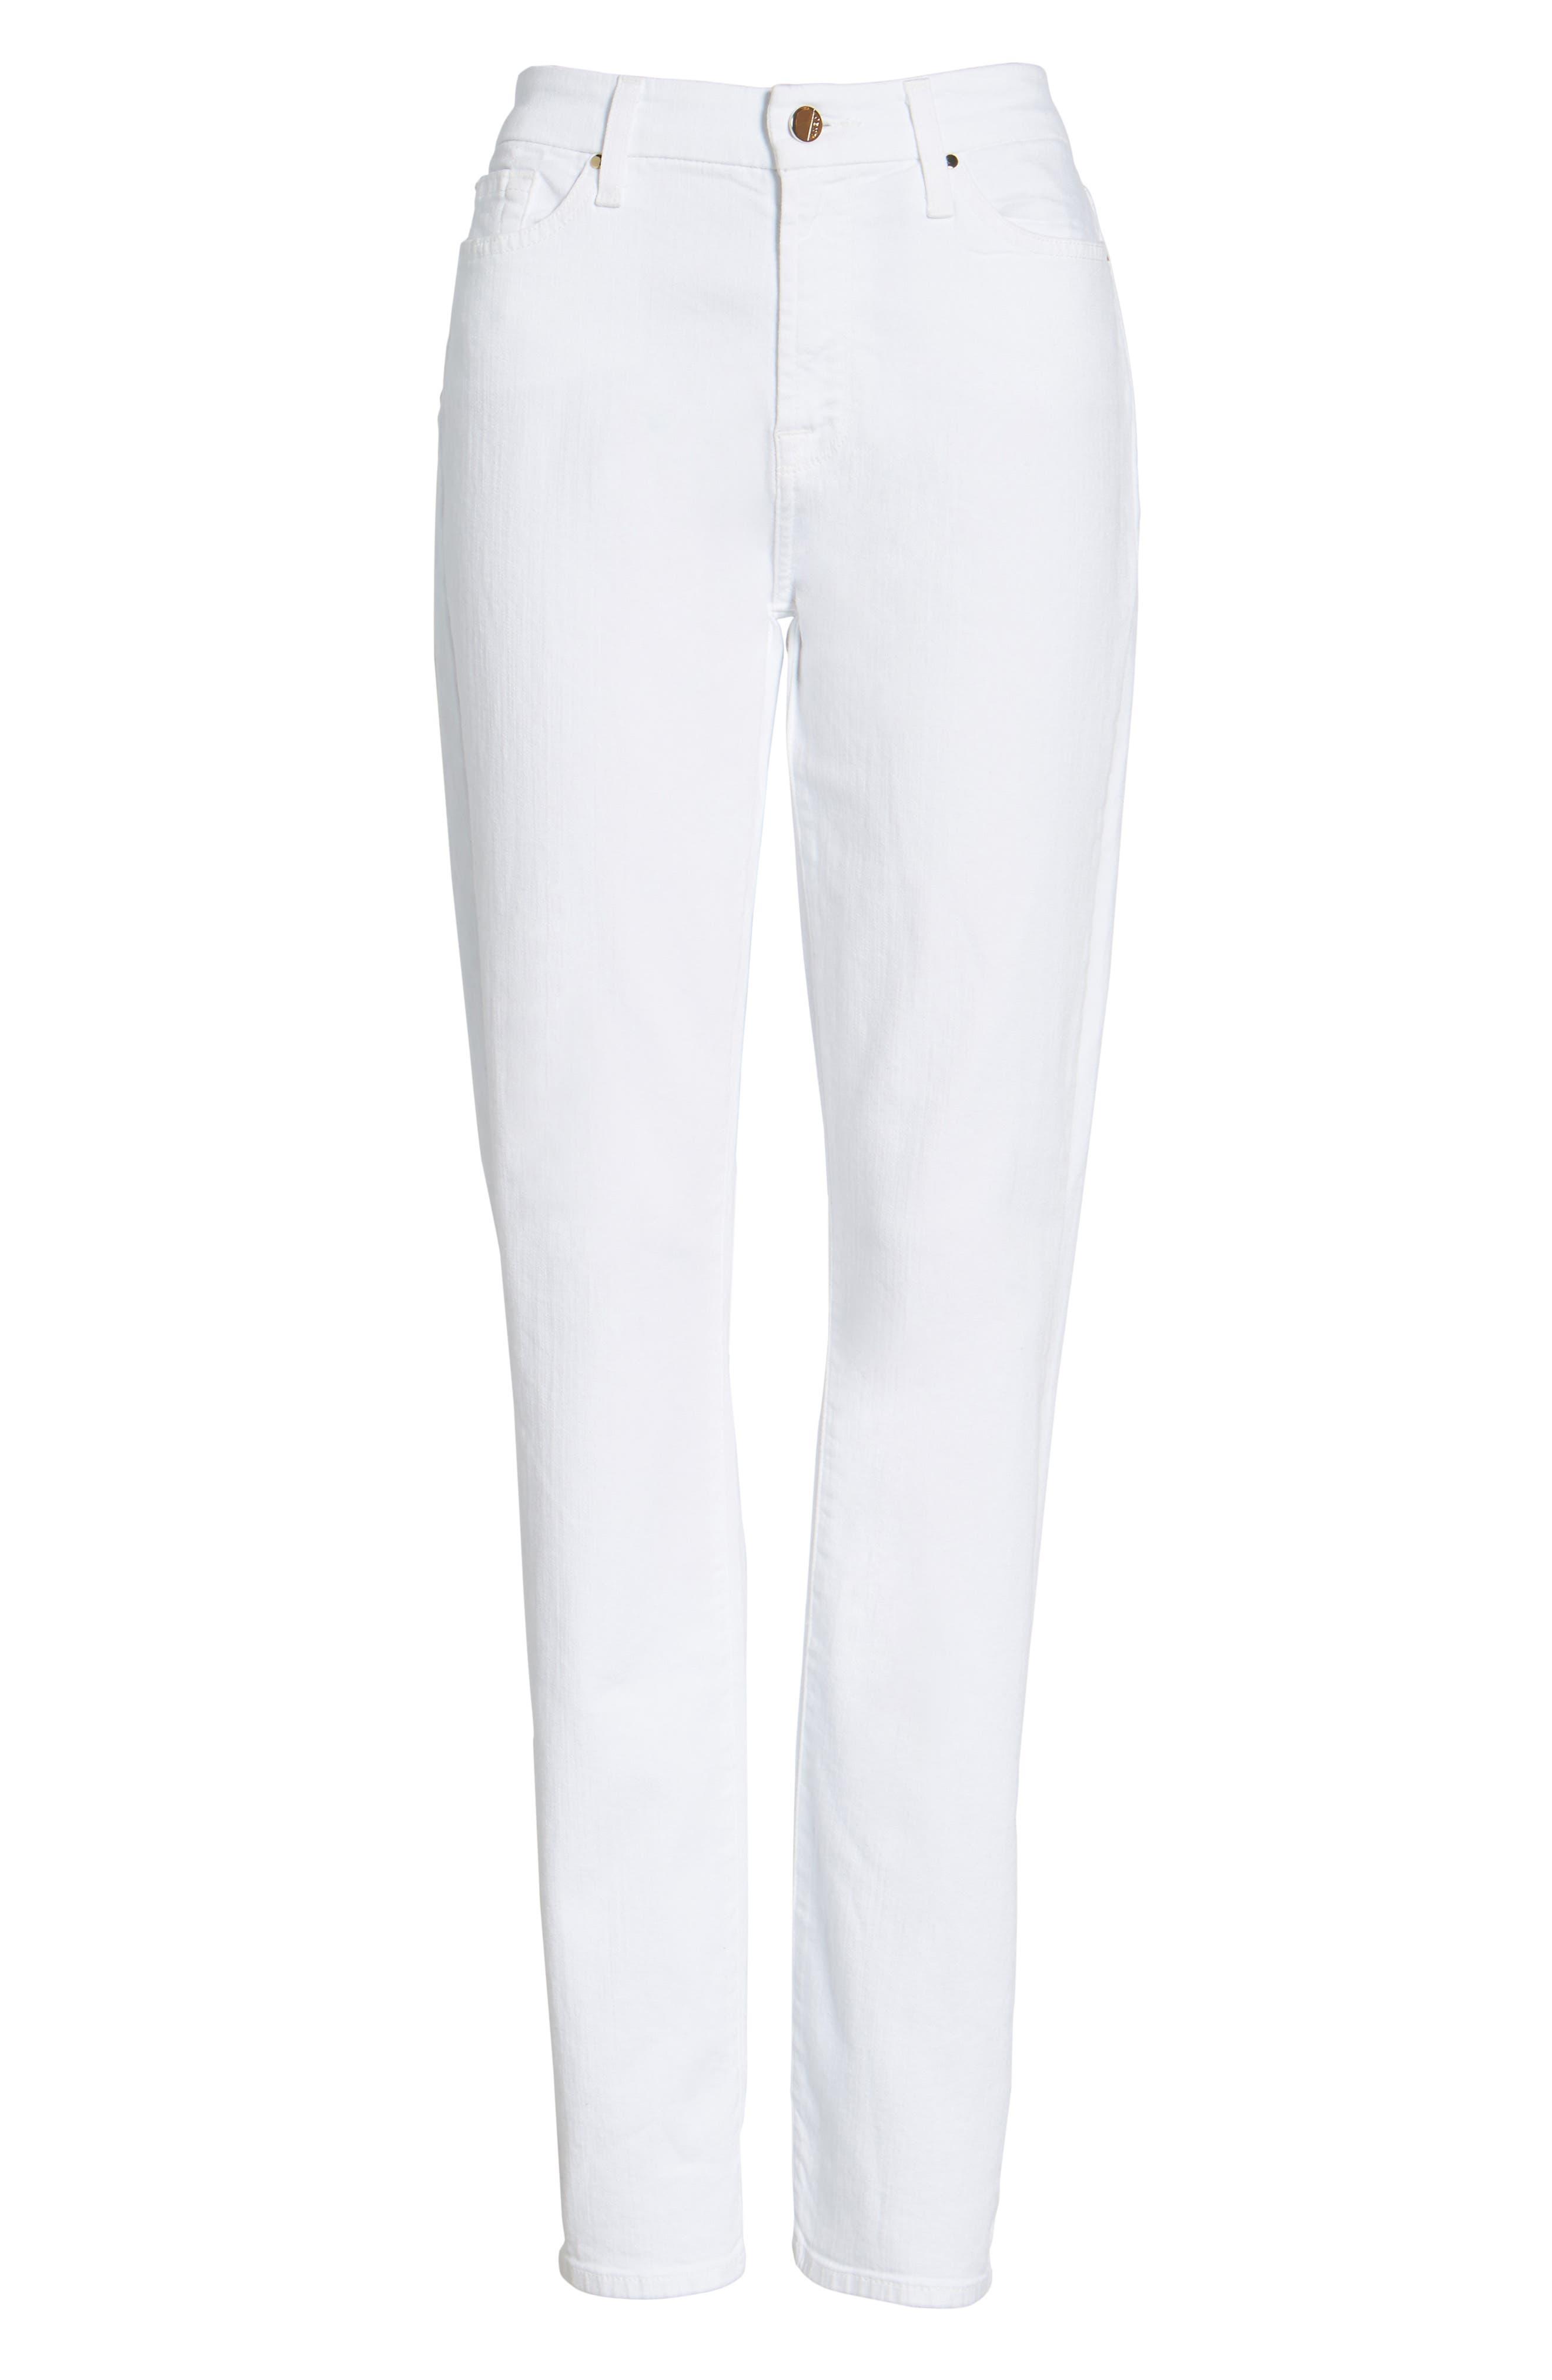 Stretch Slim Straight Leg Jeans,                             Main thumbnail 1, color,                             101